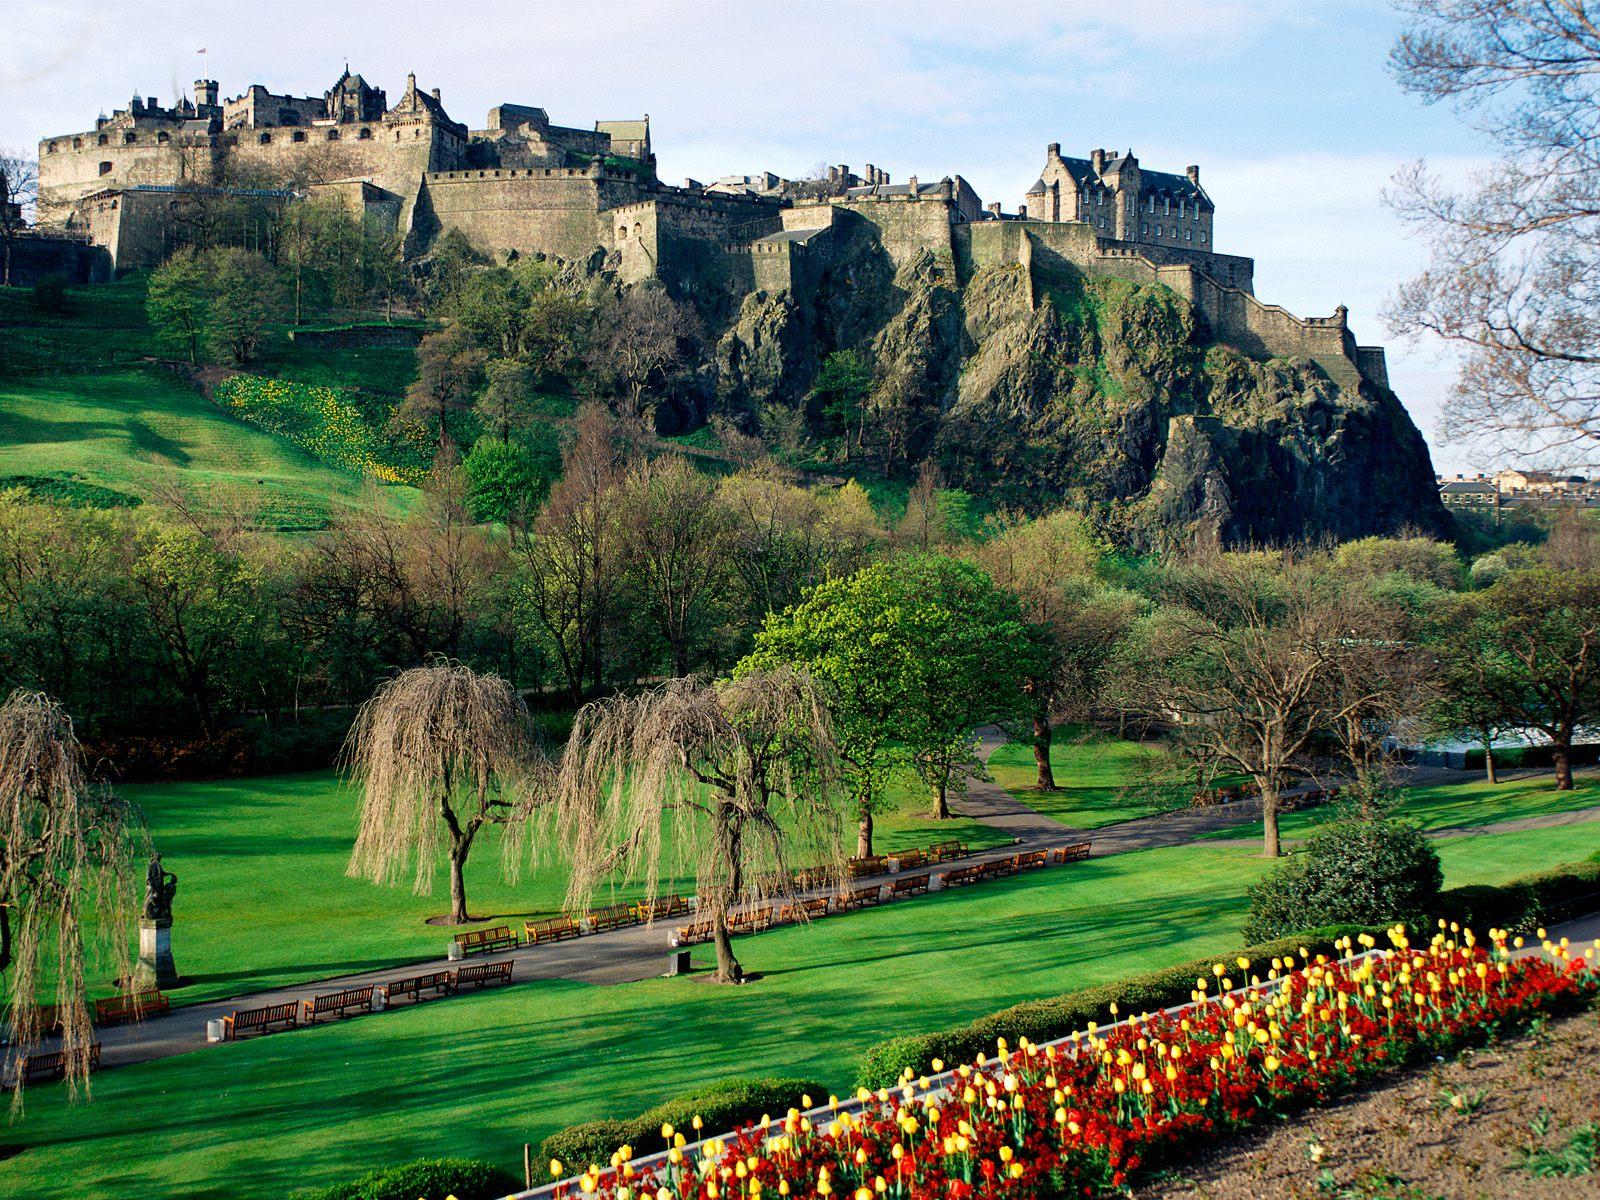 http://3.bp.blogspot.com/-GFtLMd6gBTw/T2zb-ysILnI/AAAAAAAAOQQ/UcTV1TdW3zw/s1600/wonderful-Edinburgh-Castle-Scotland.jpg